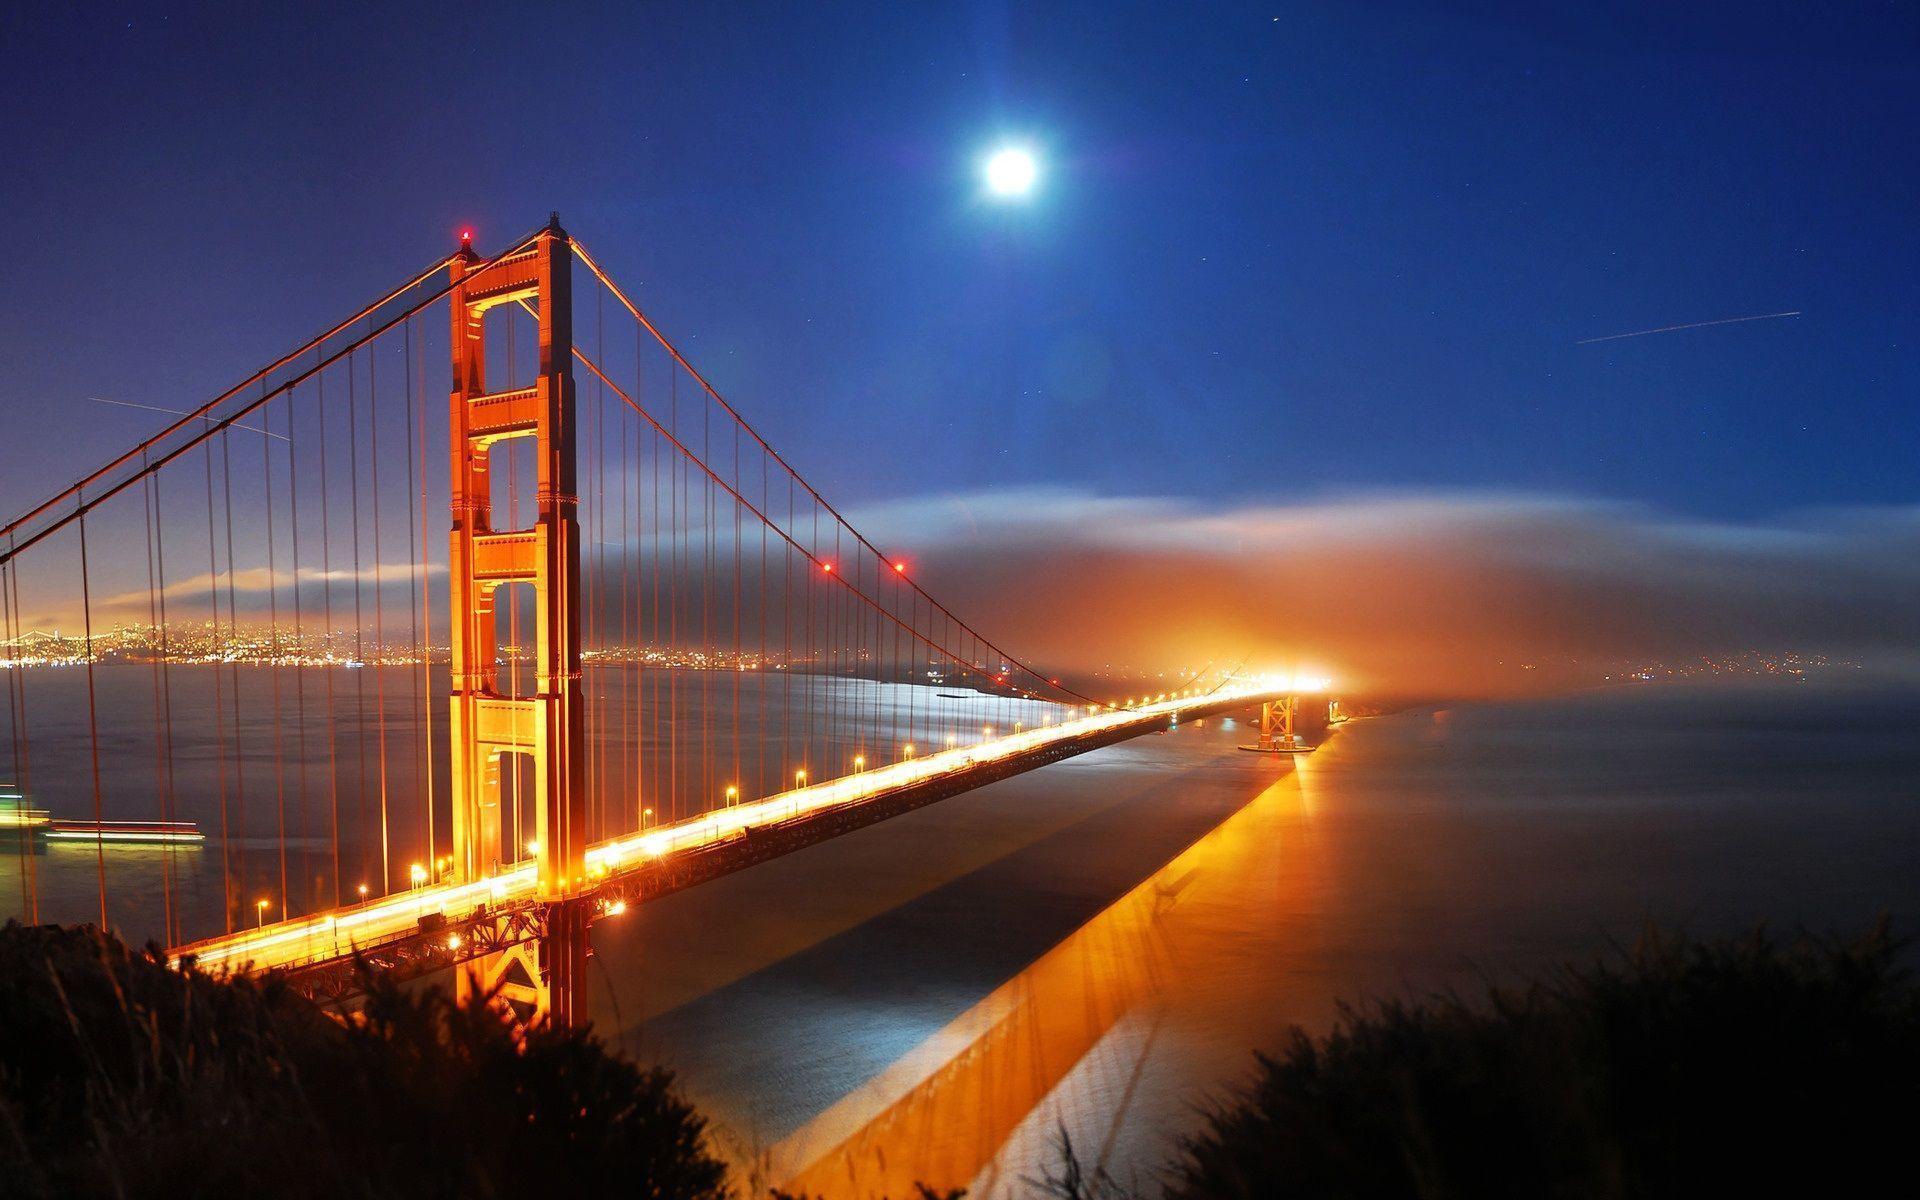 San Francisco Bridge Night Lights Hd Wallpaper « Travel & World ...